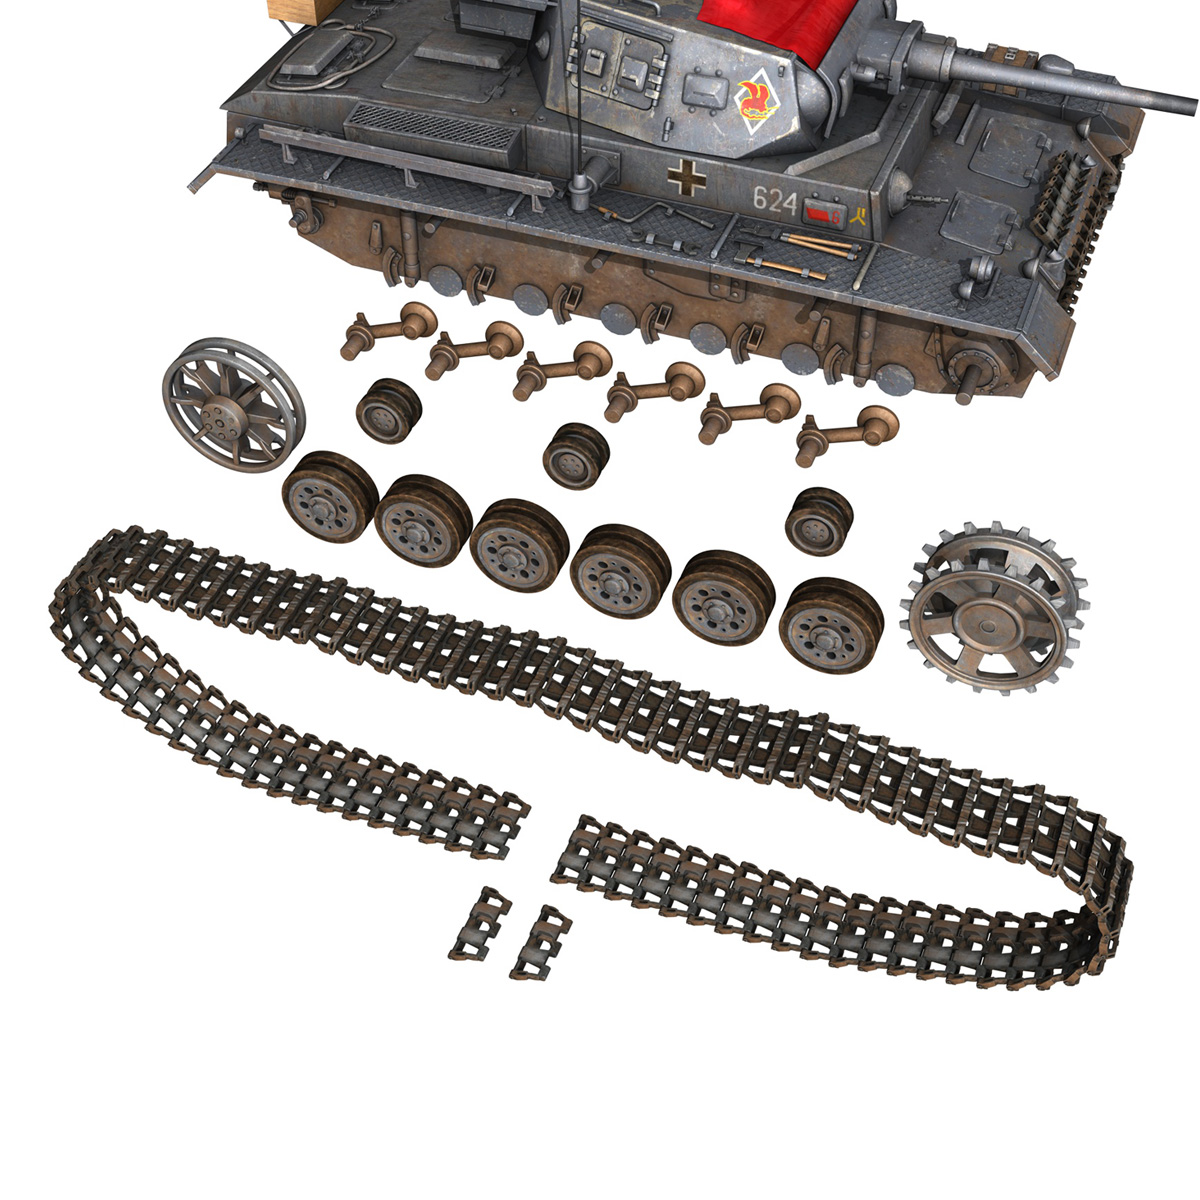 pzkpfw iii – panzer 3 – ausf.j – 624 3d model 3ds fbx lwo lw lws obj c4d 265307